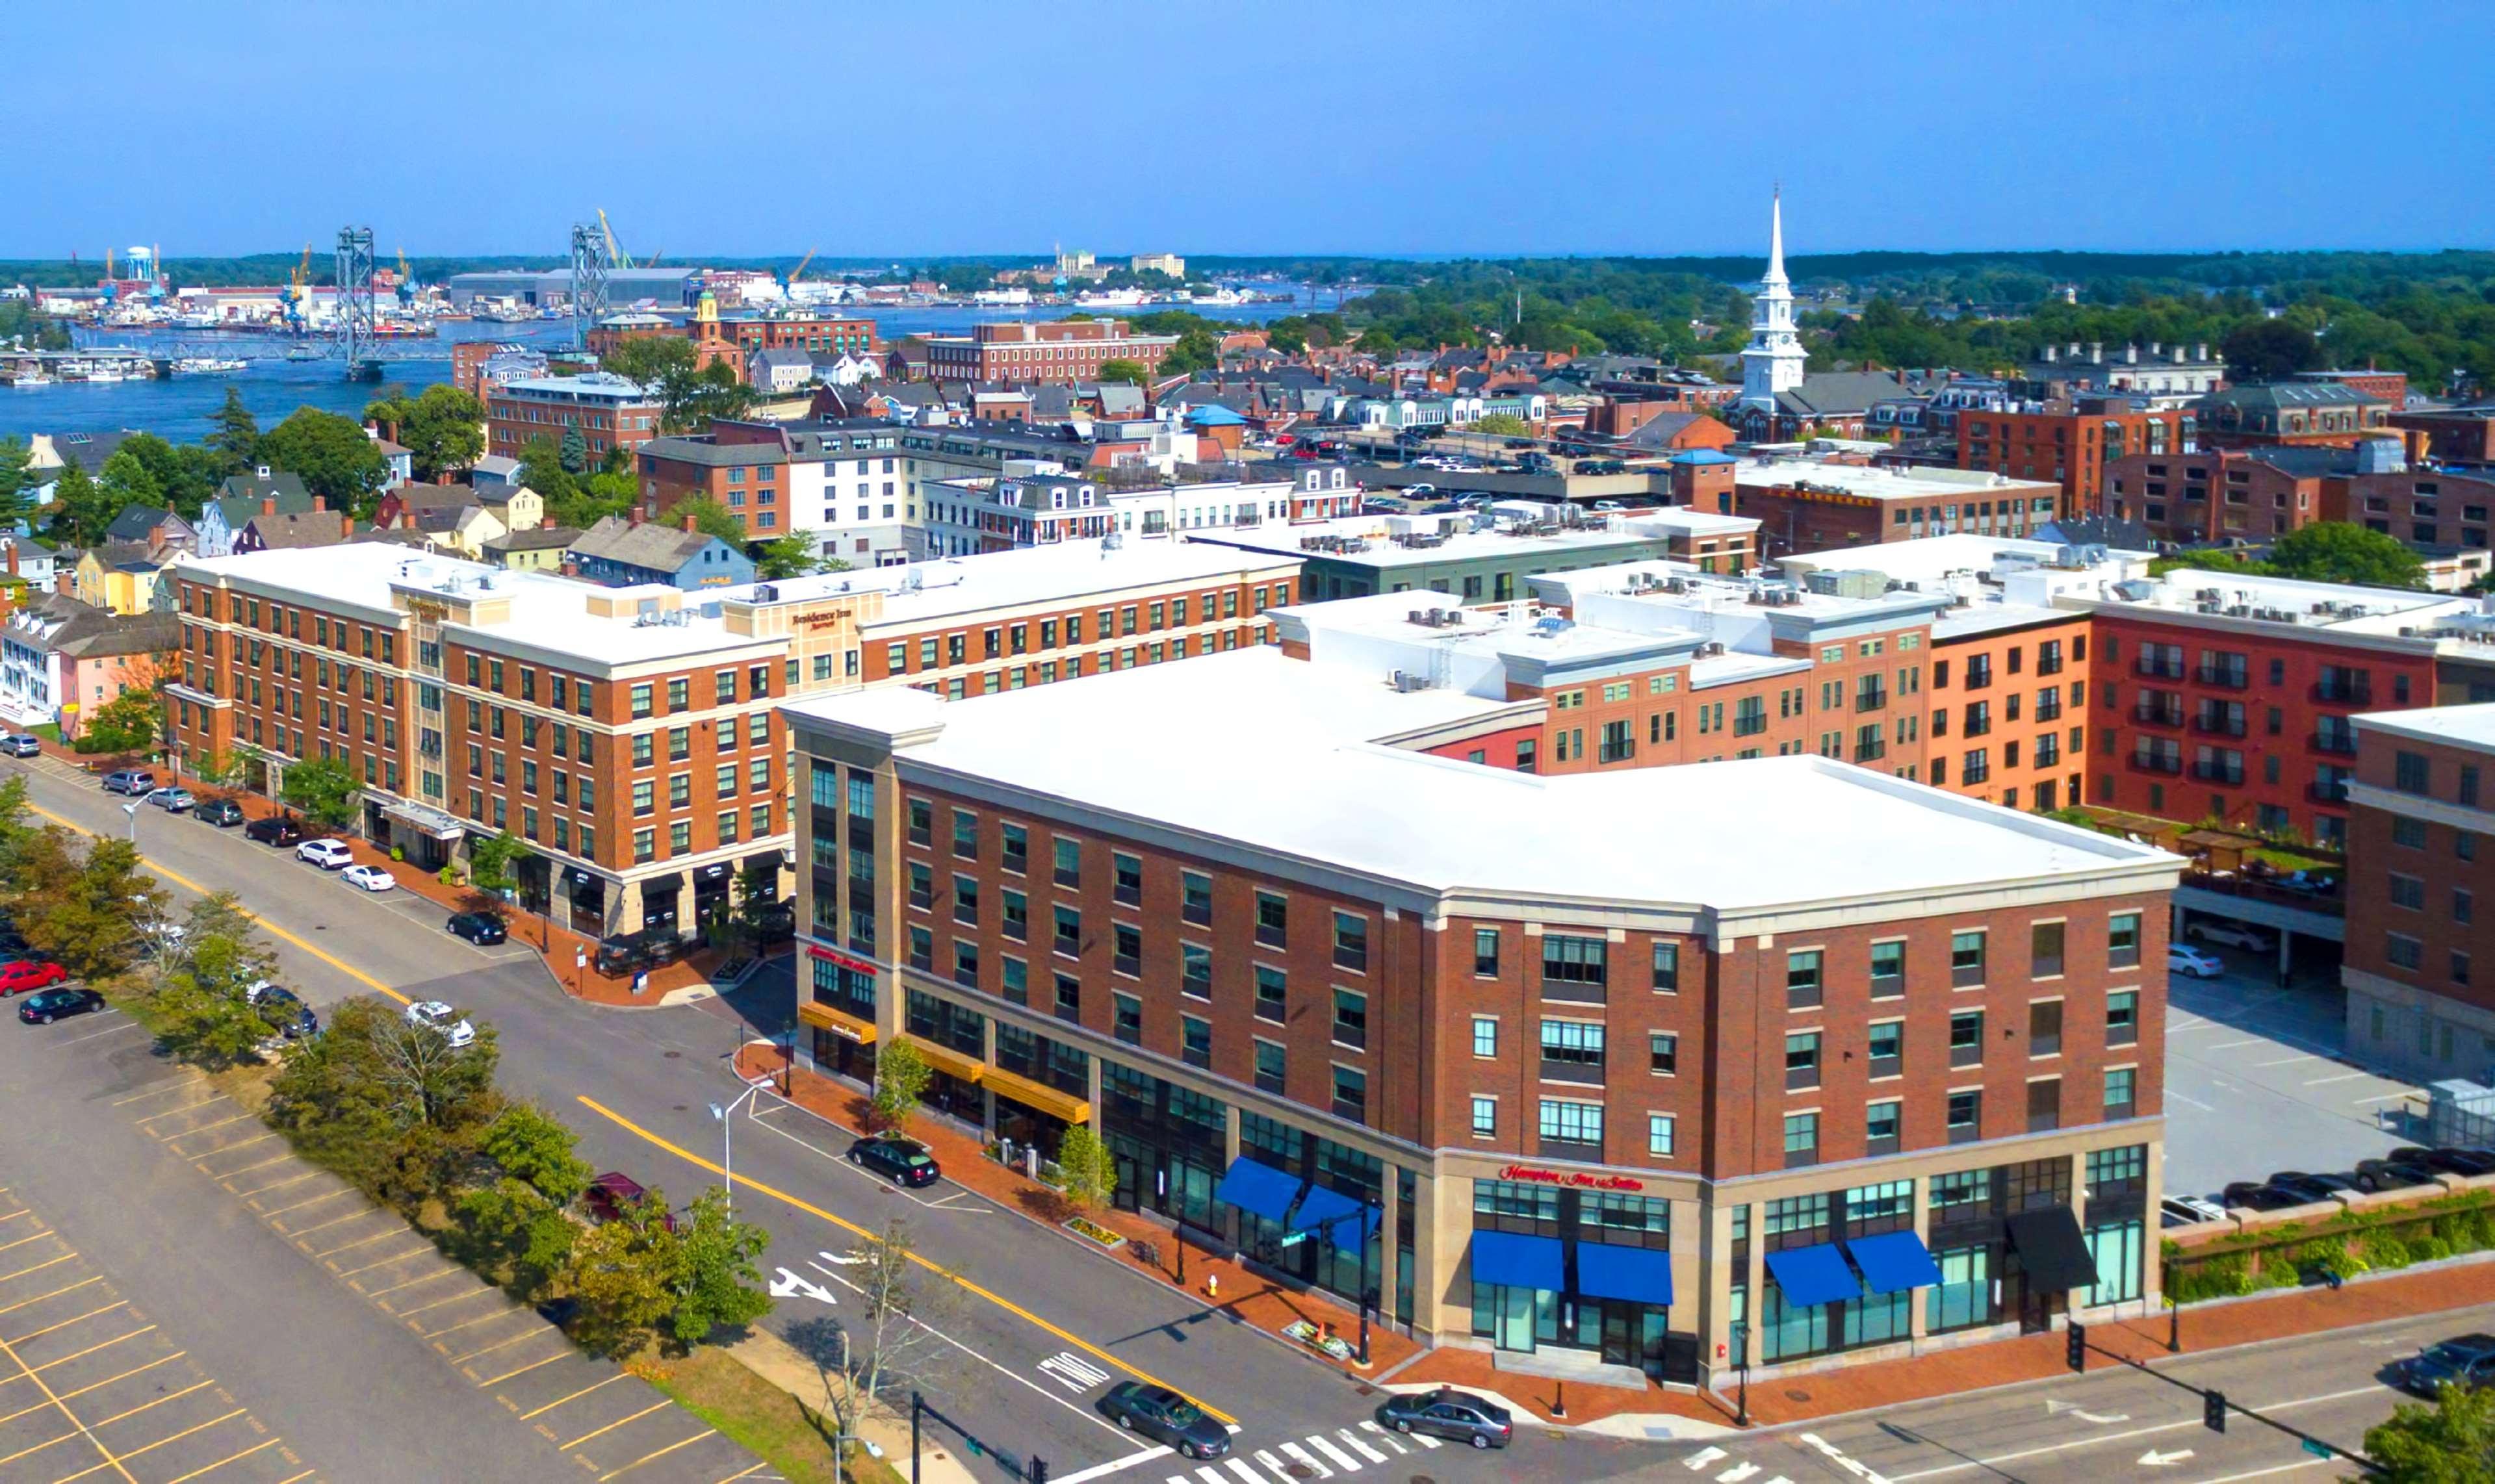 Hampton Inn & Suites Portsmouth Downtown image 1